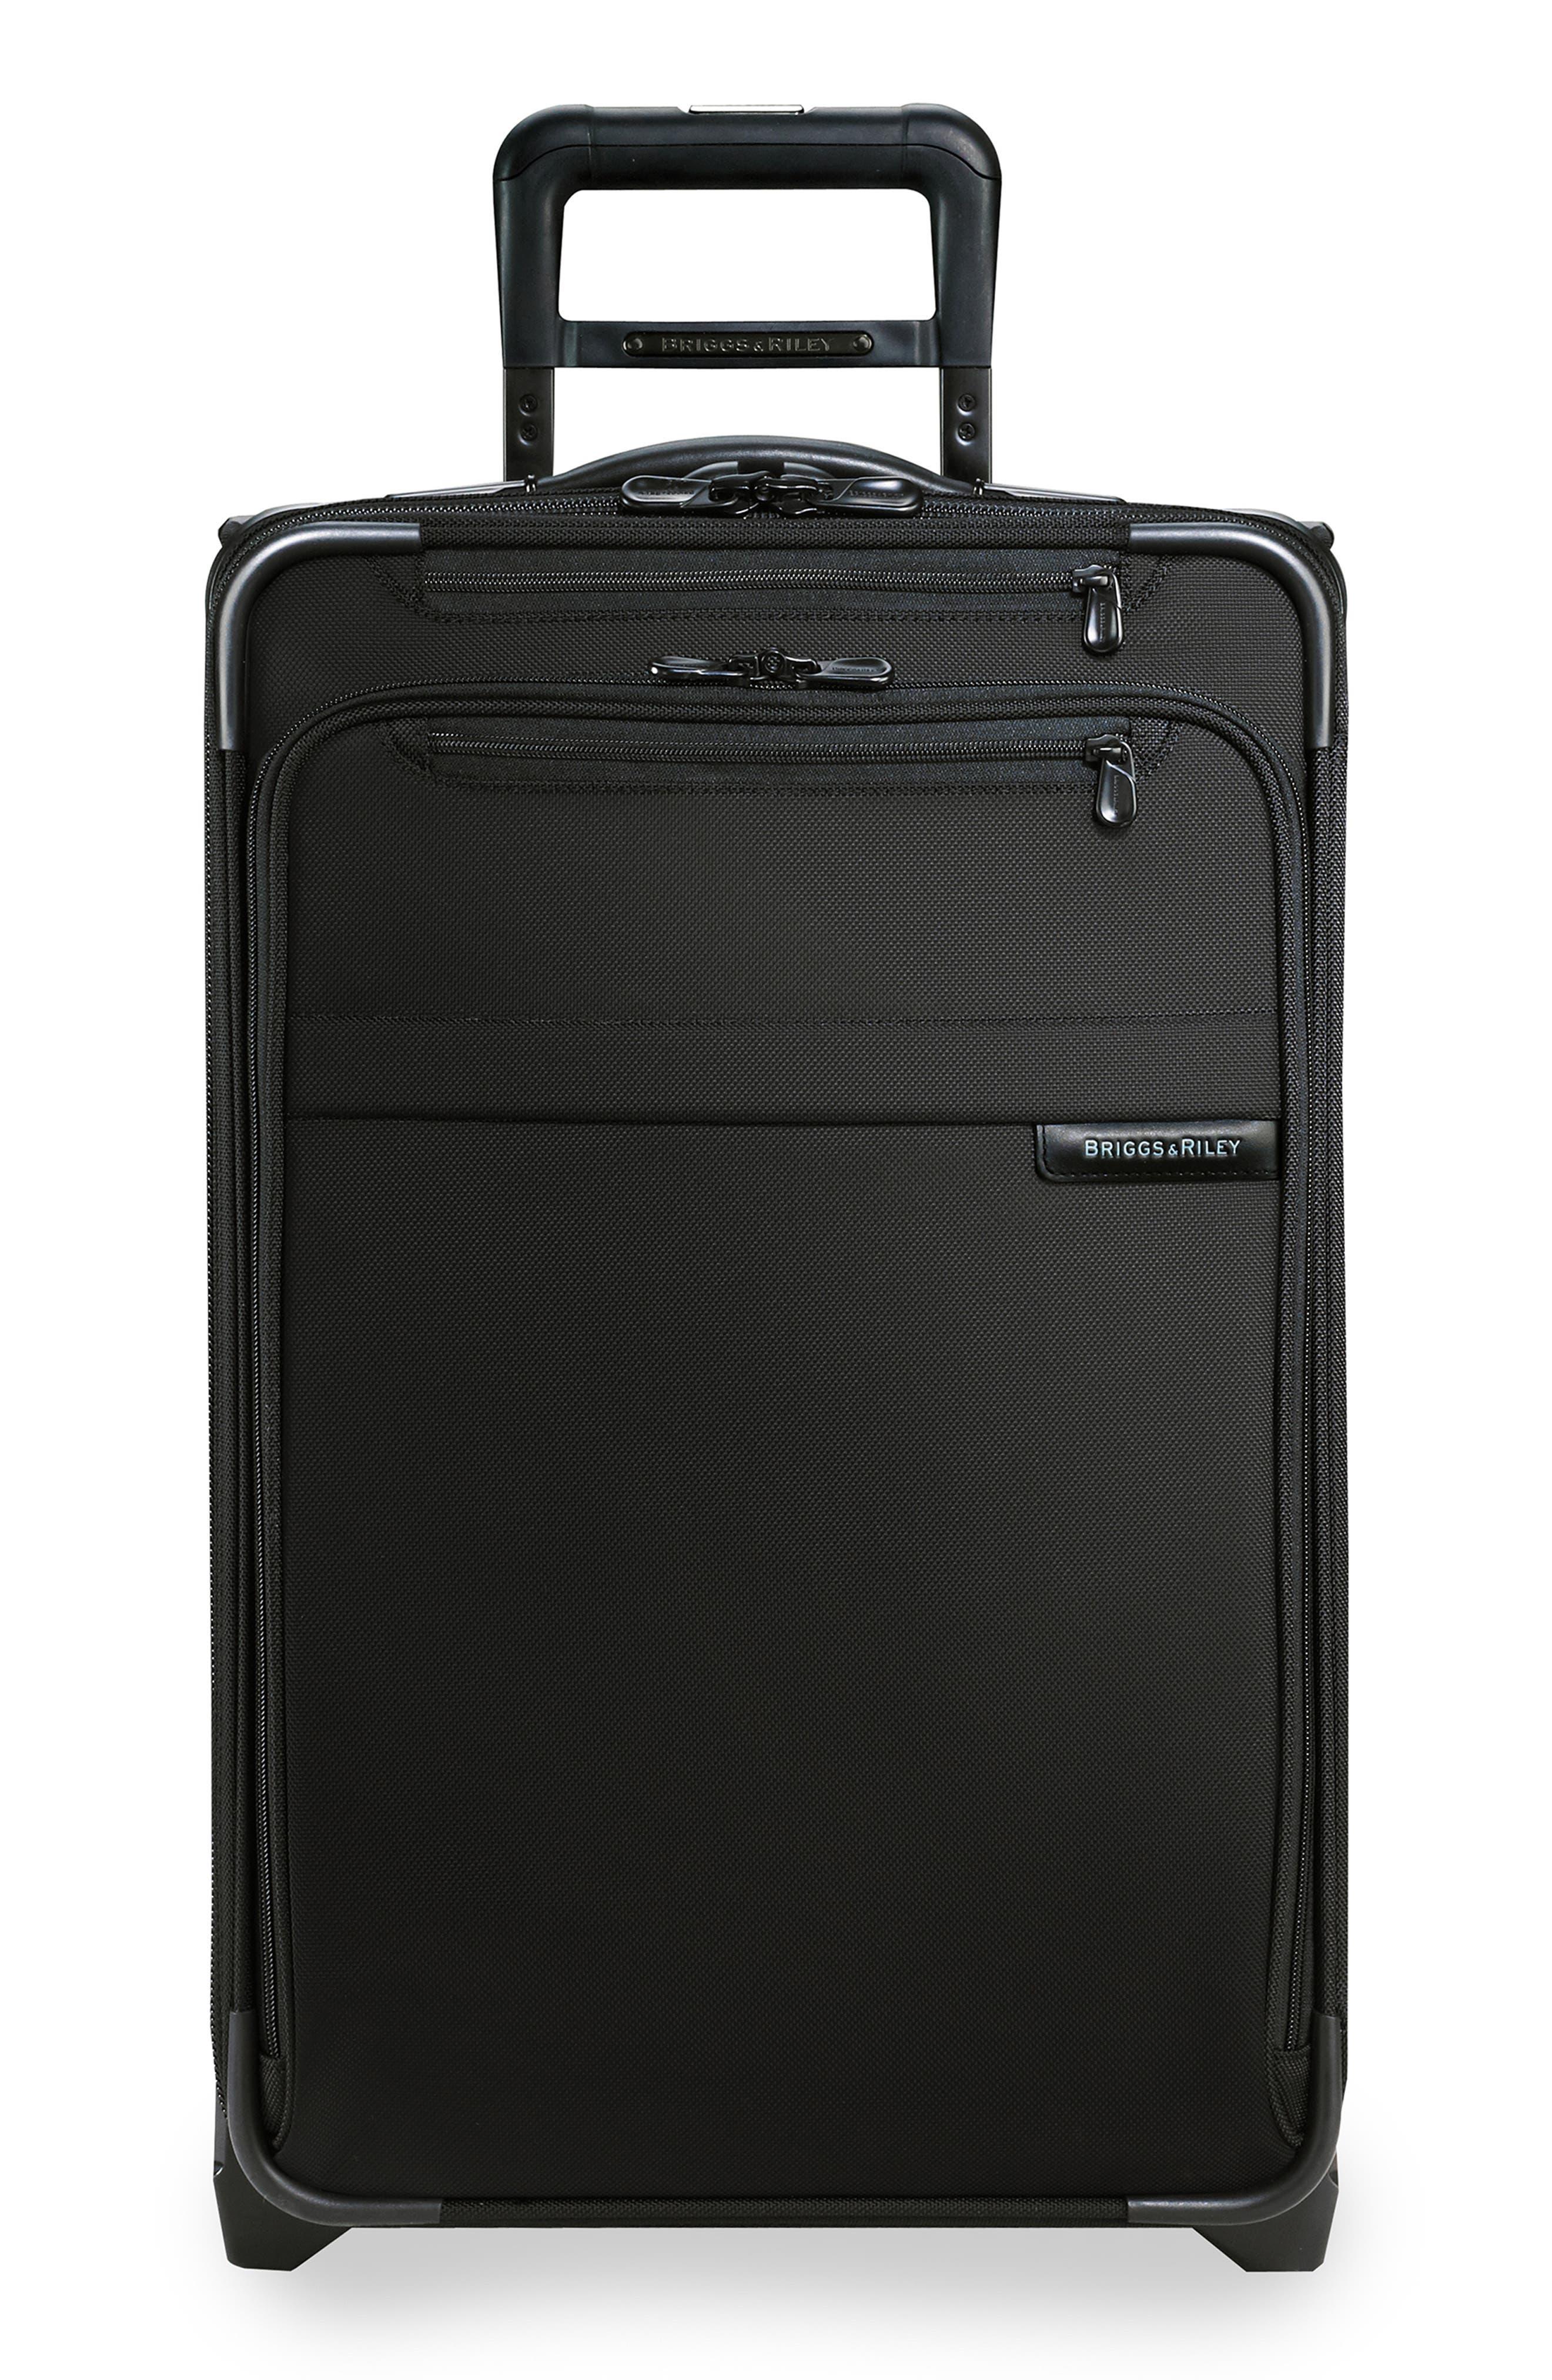 Baseline 22-Inch Expandable Wheeled Carry-On